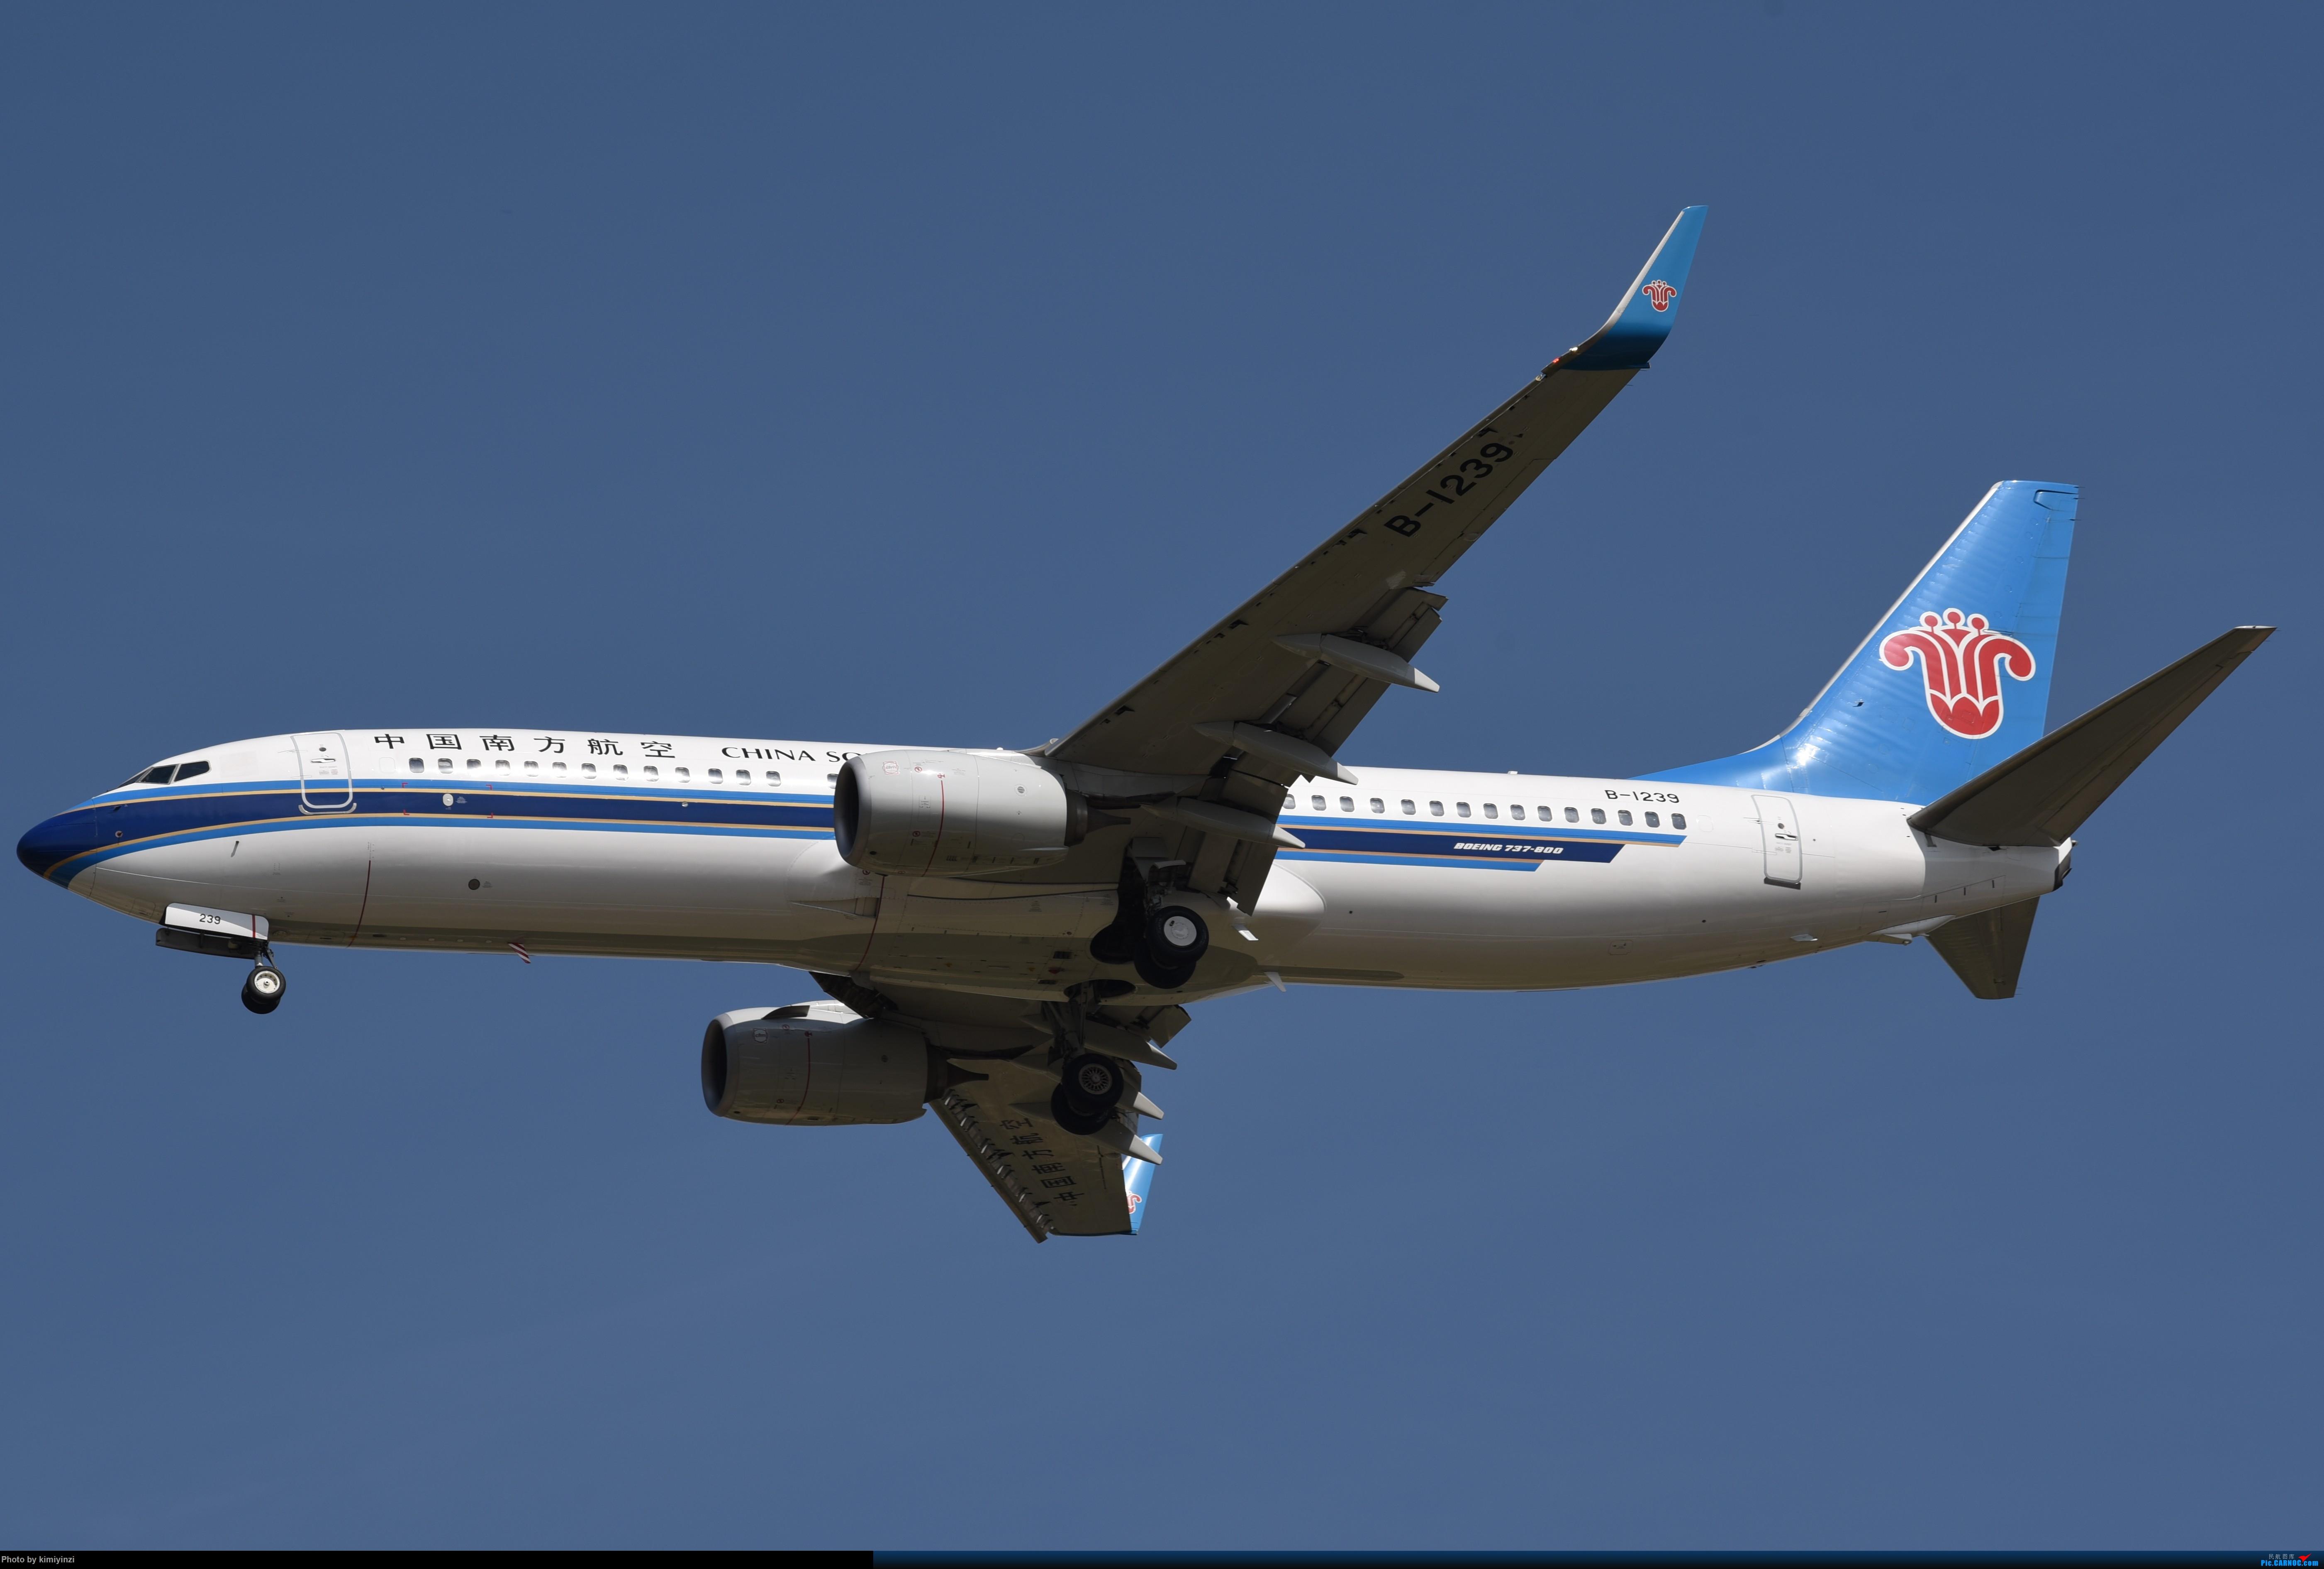 Re:[原创]KWE非常时期的贵阳龙洞堡 BOEING 737-800 B-1239 中国贵阳龙洞堡国际机场